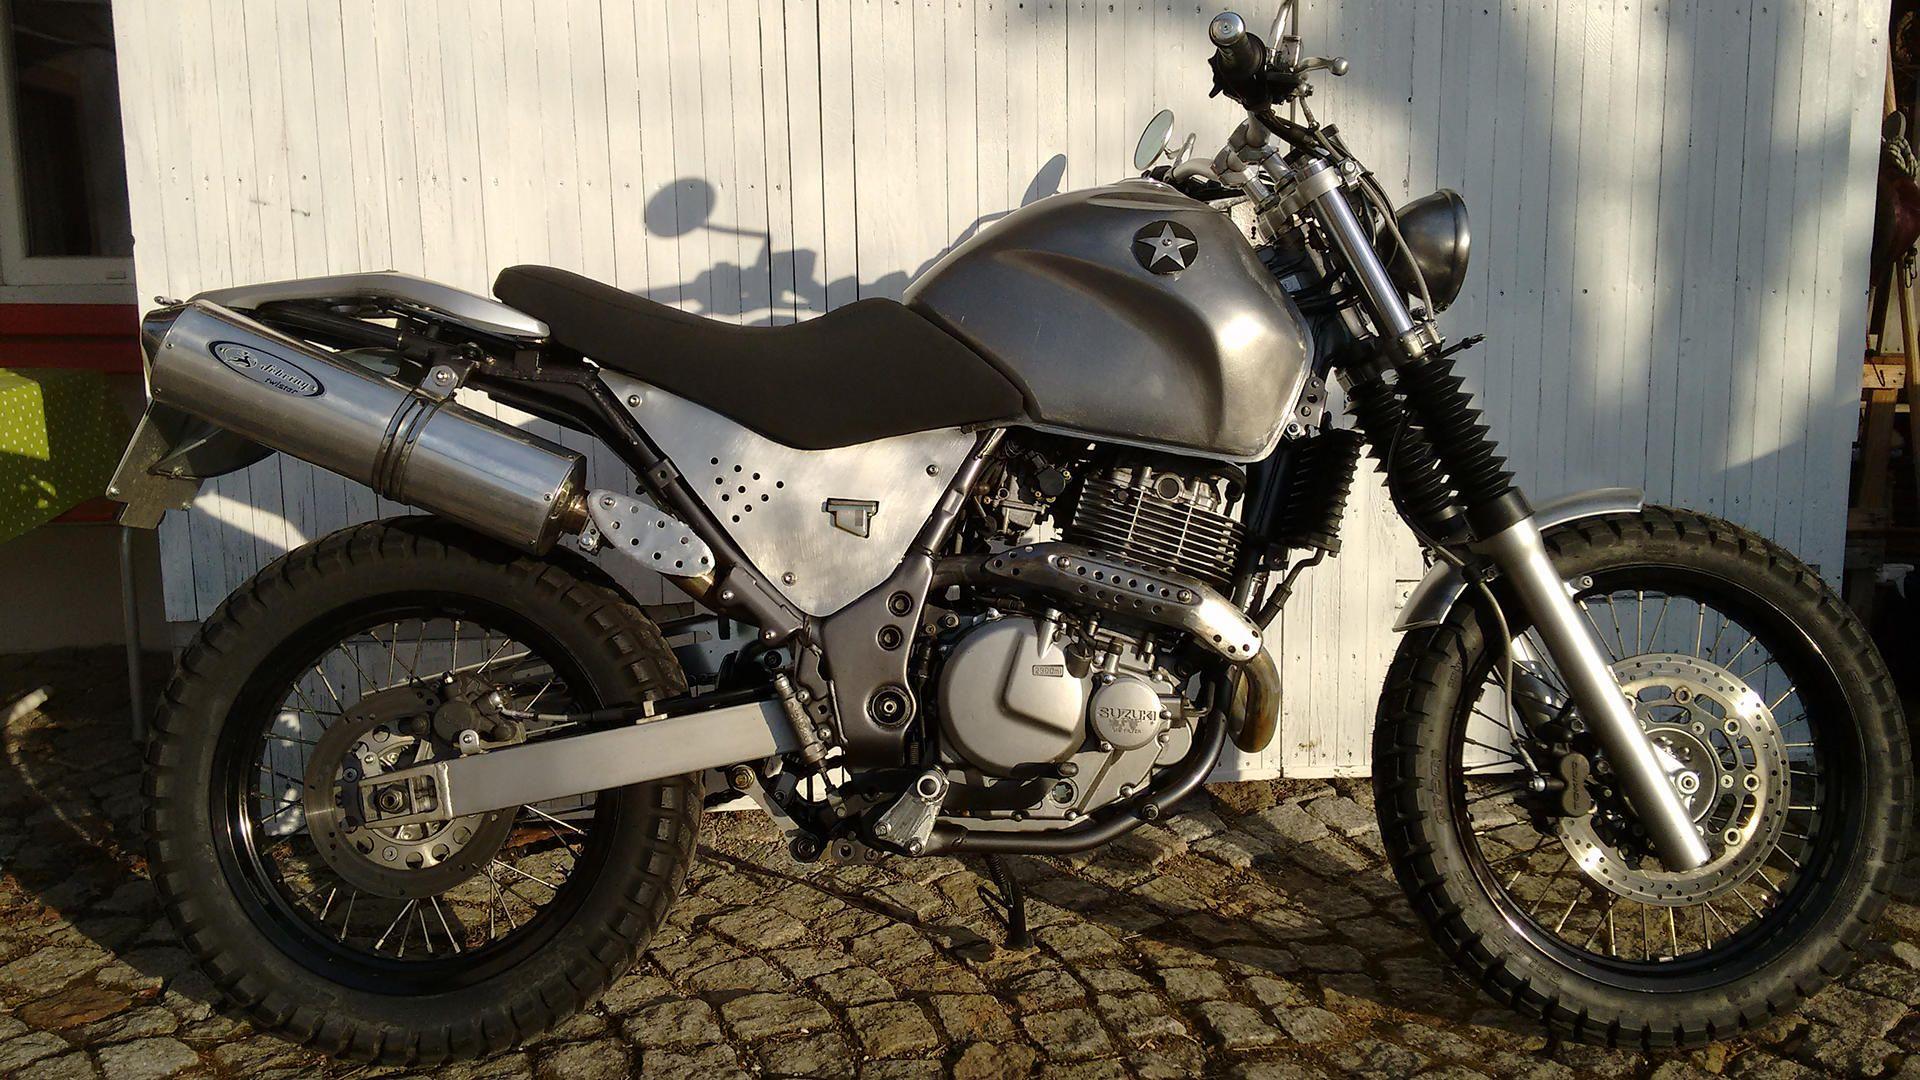 Honda Motorräder VTX 1800 Tests & Fahrberichte, aktuelle